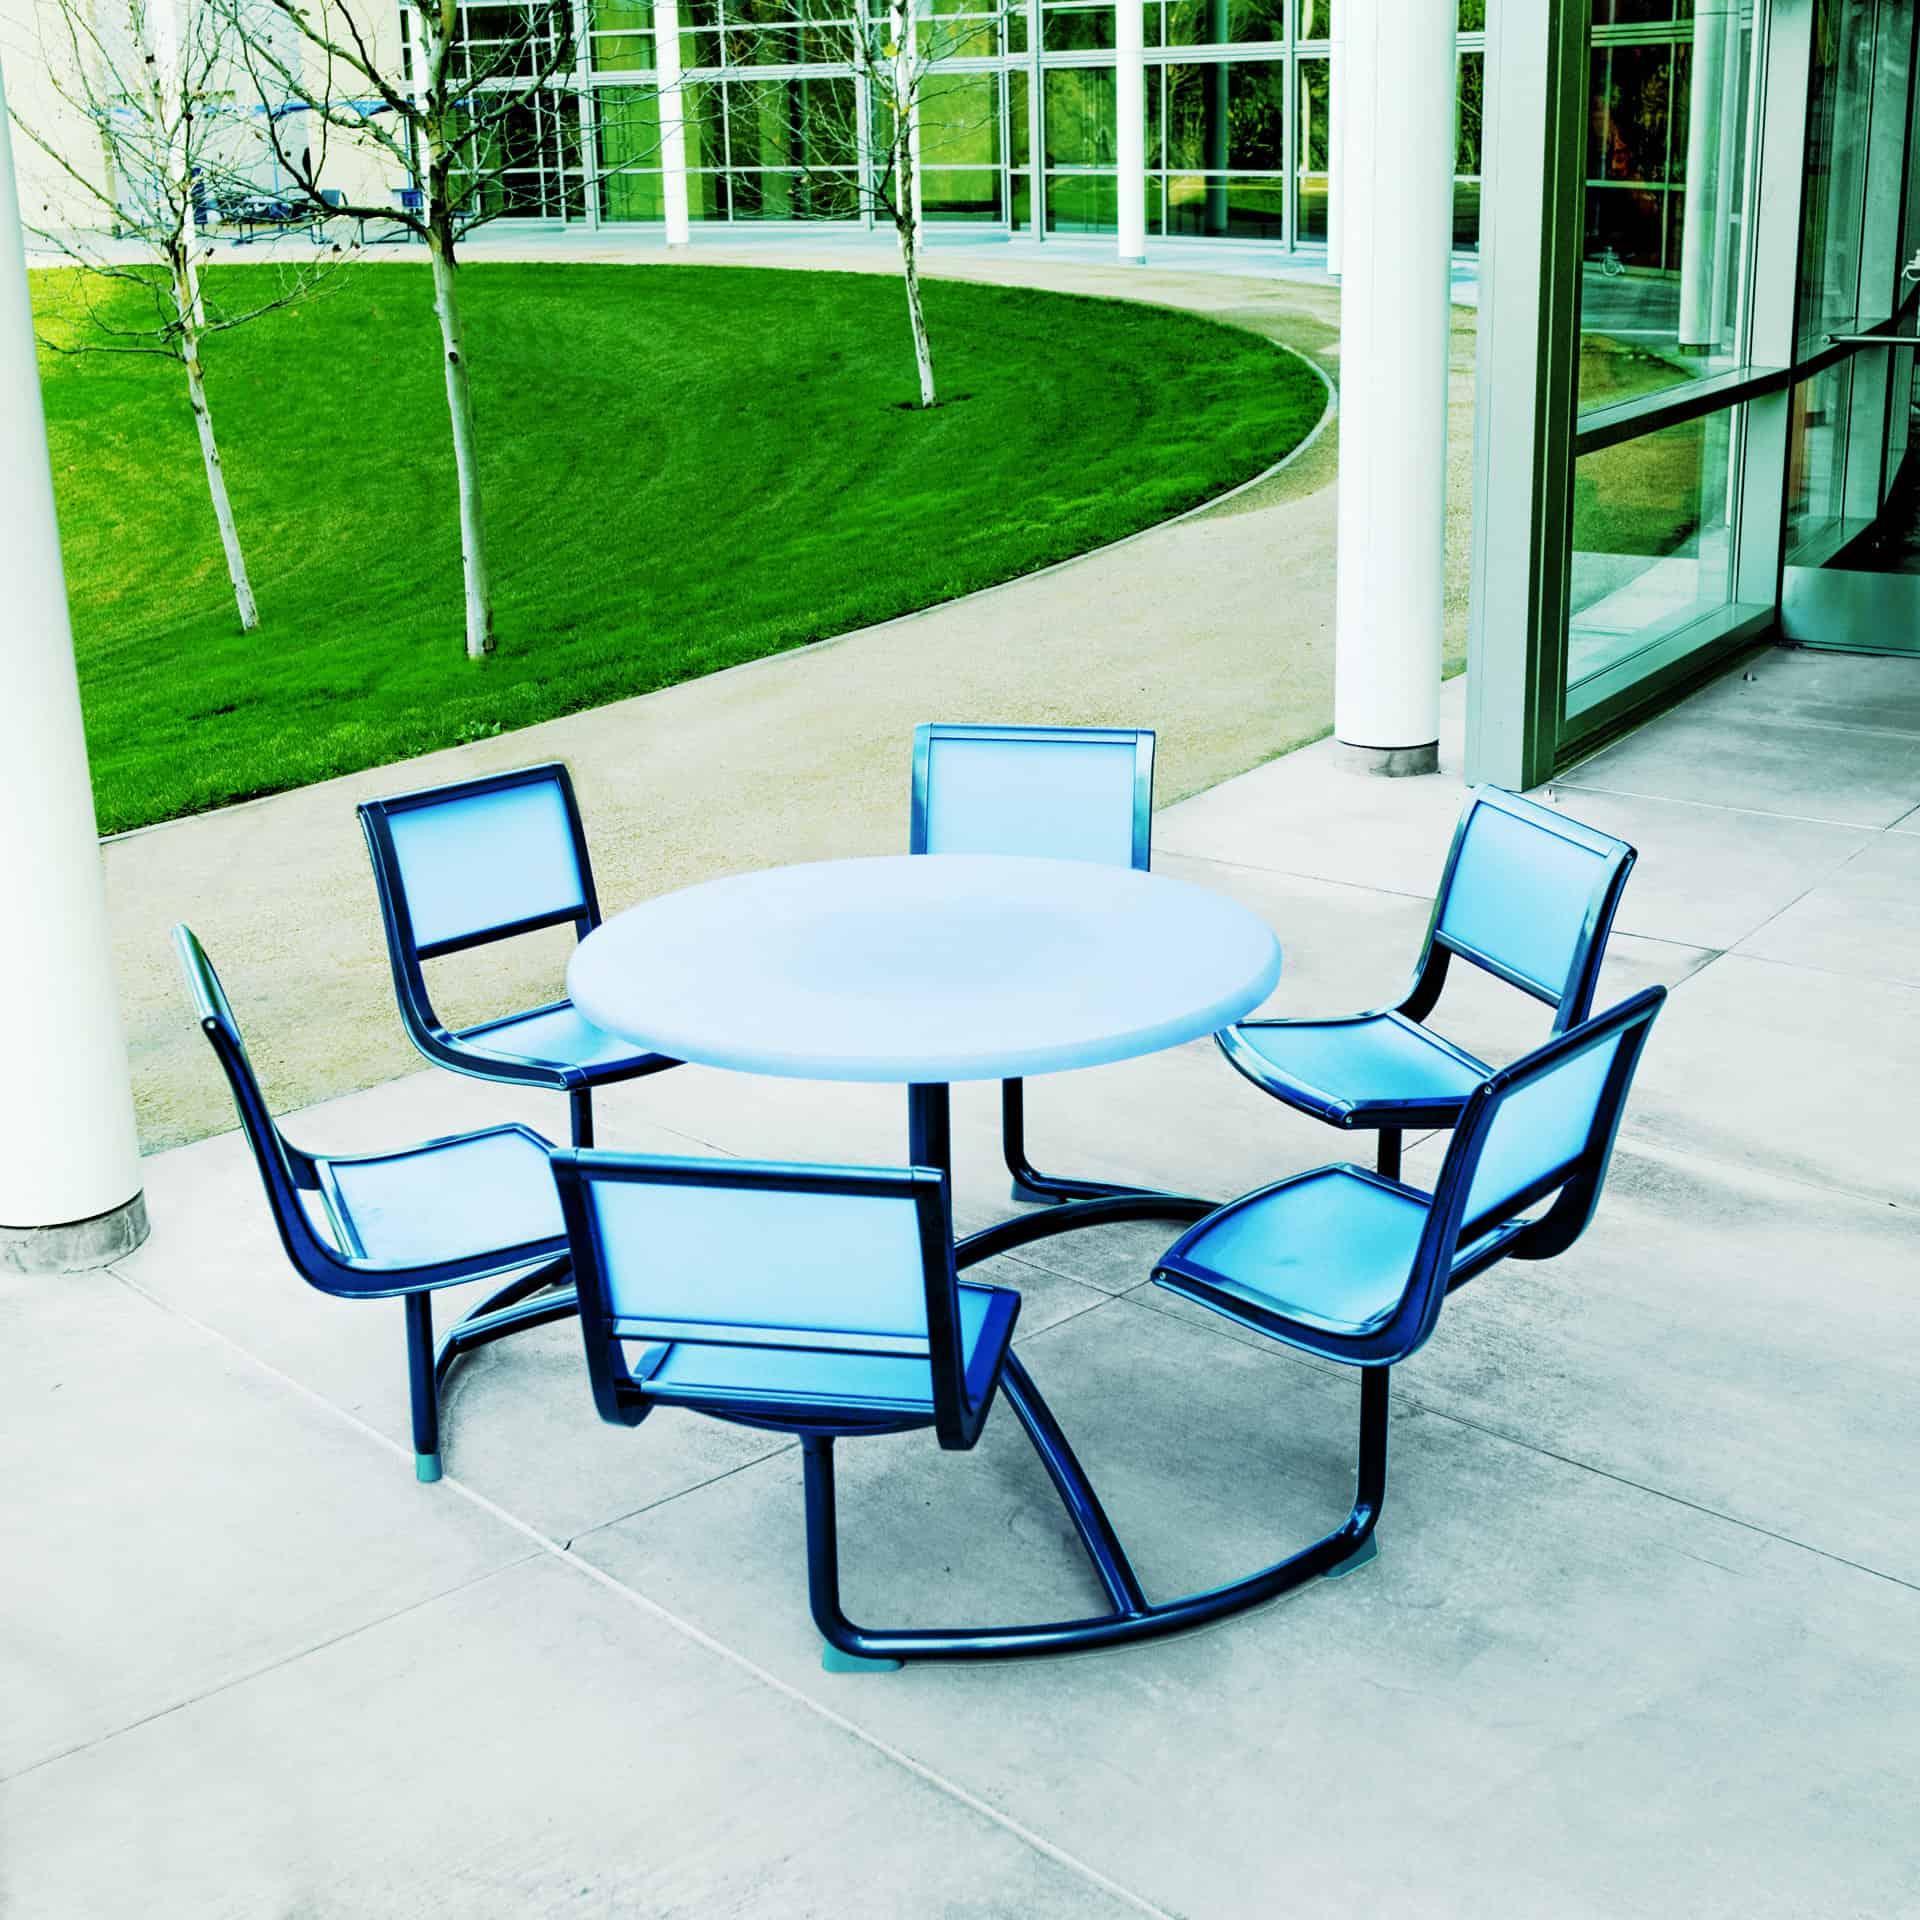 Landscapeforms Mingle Table - SEO Website Links